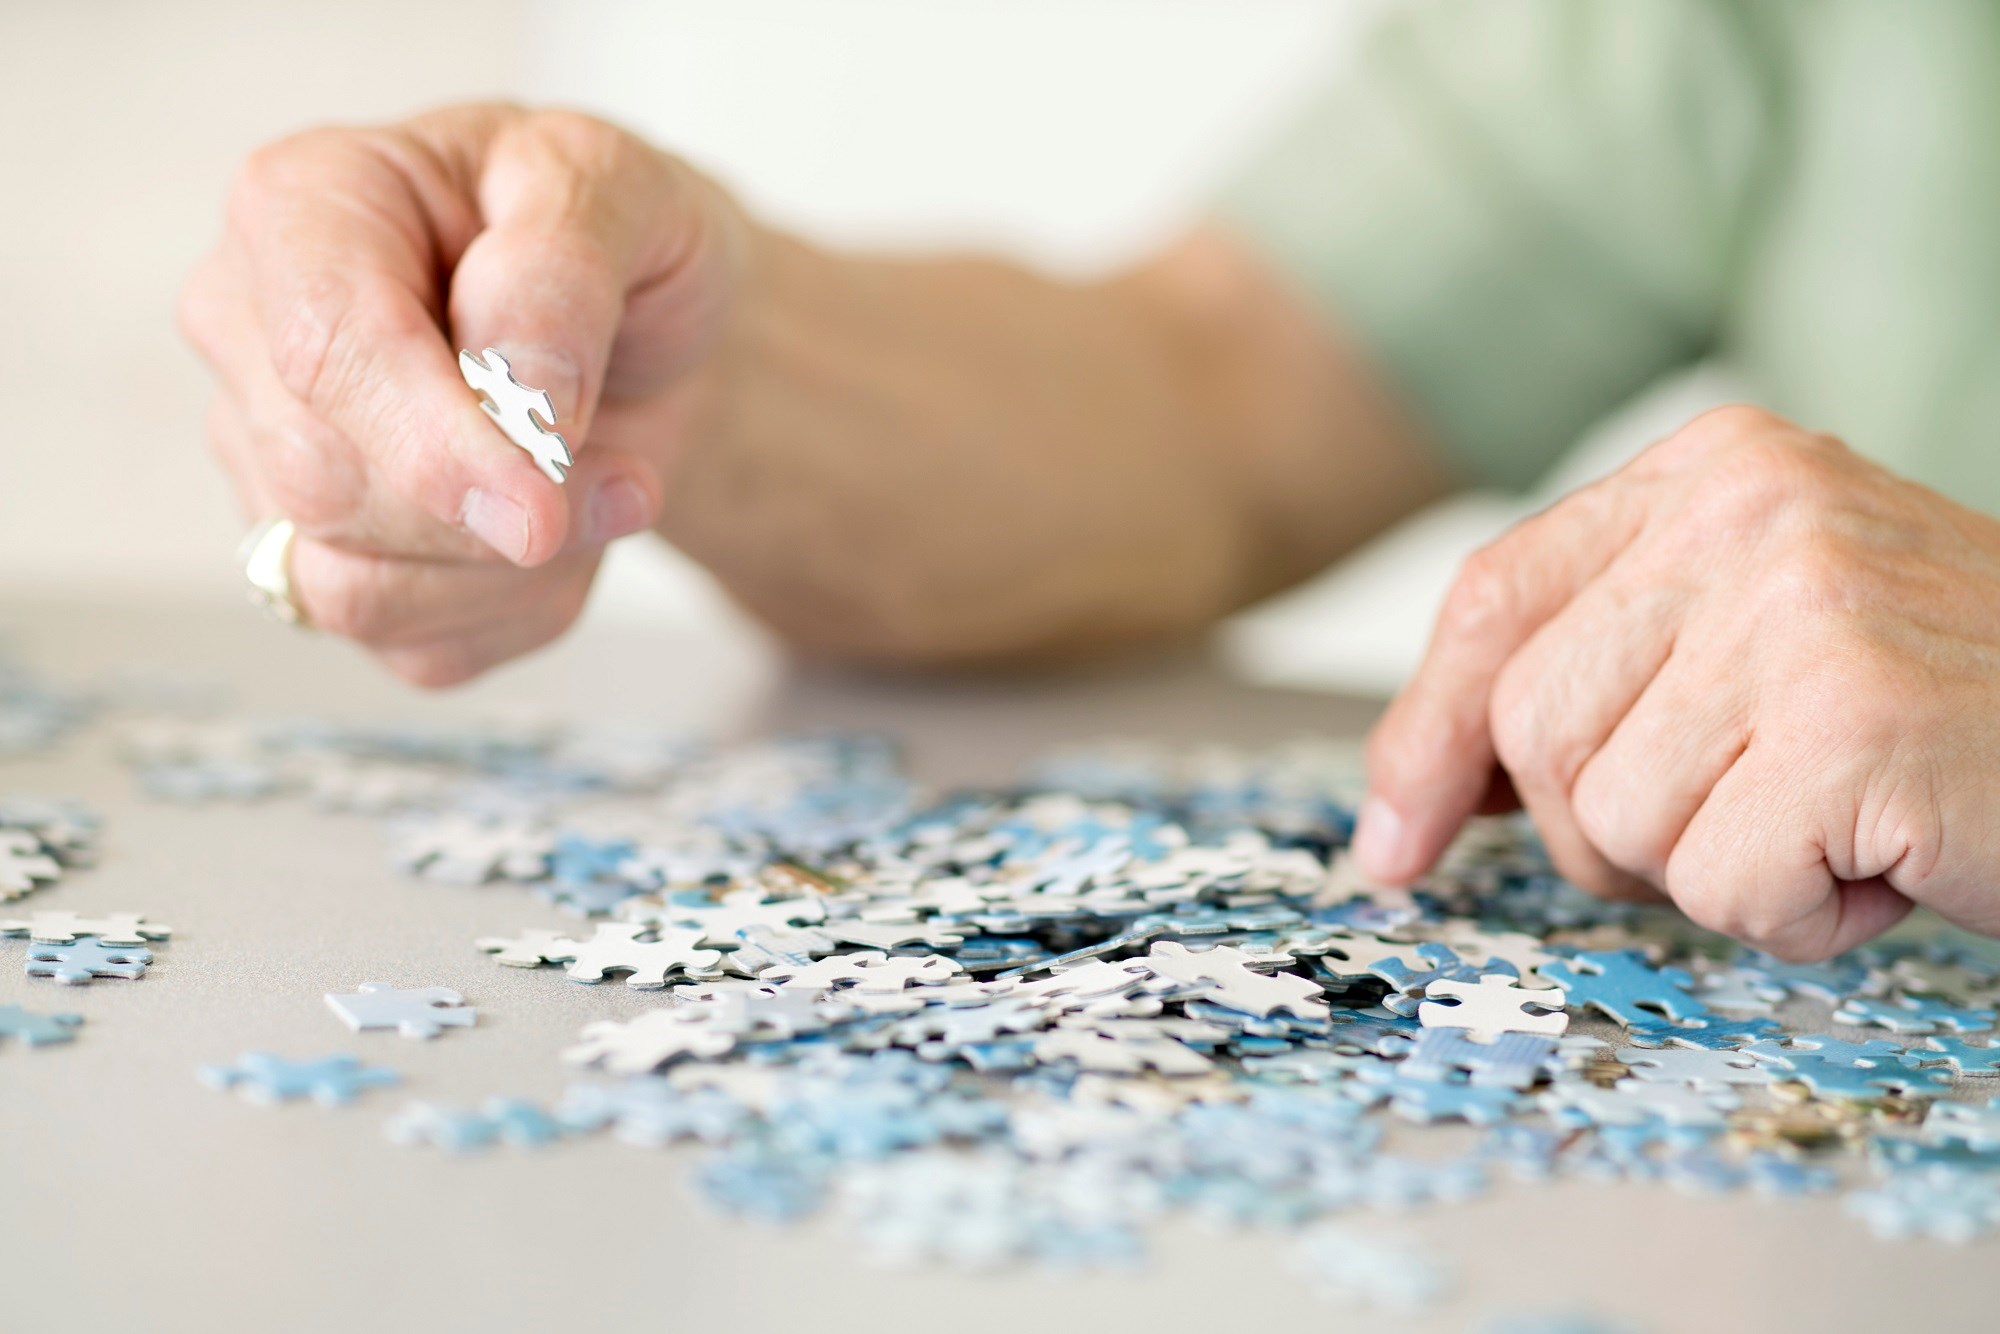 Risk Factors for Impulse Control Behaviors in Parkinson Disease